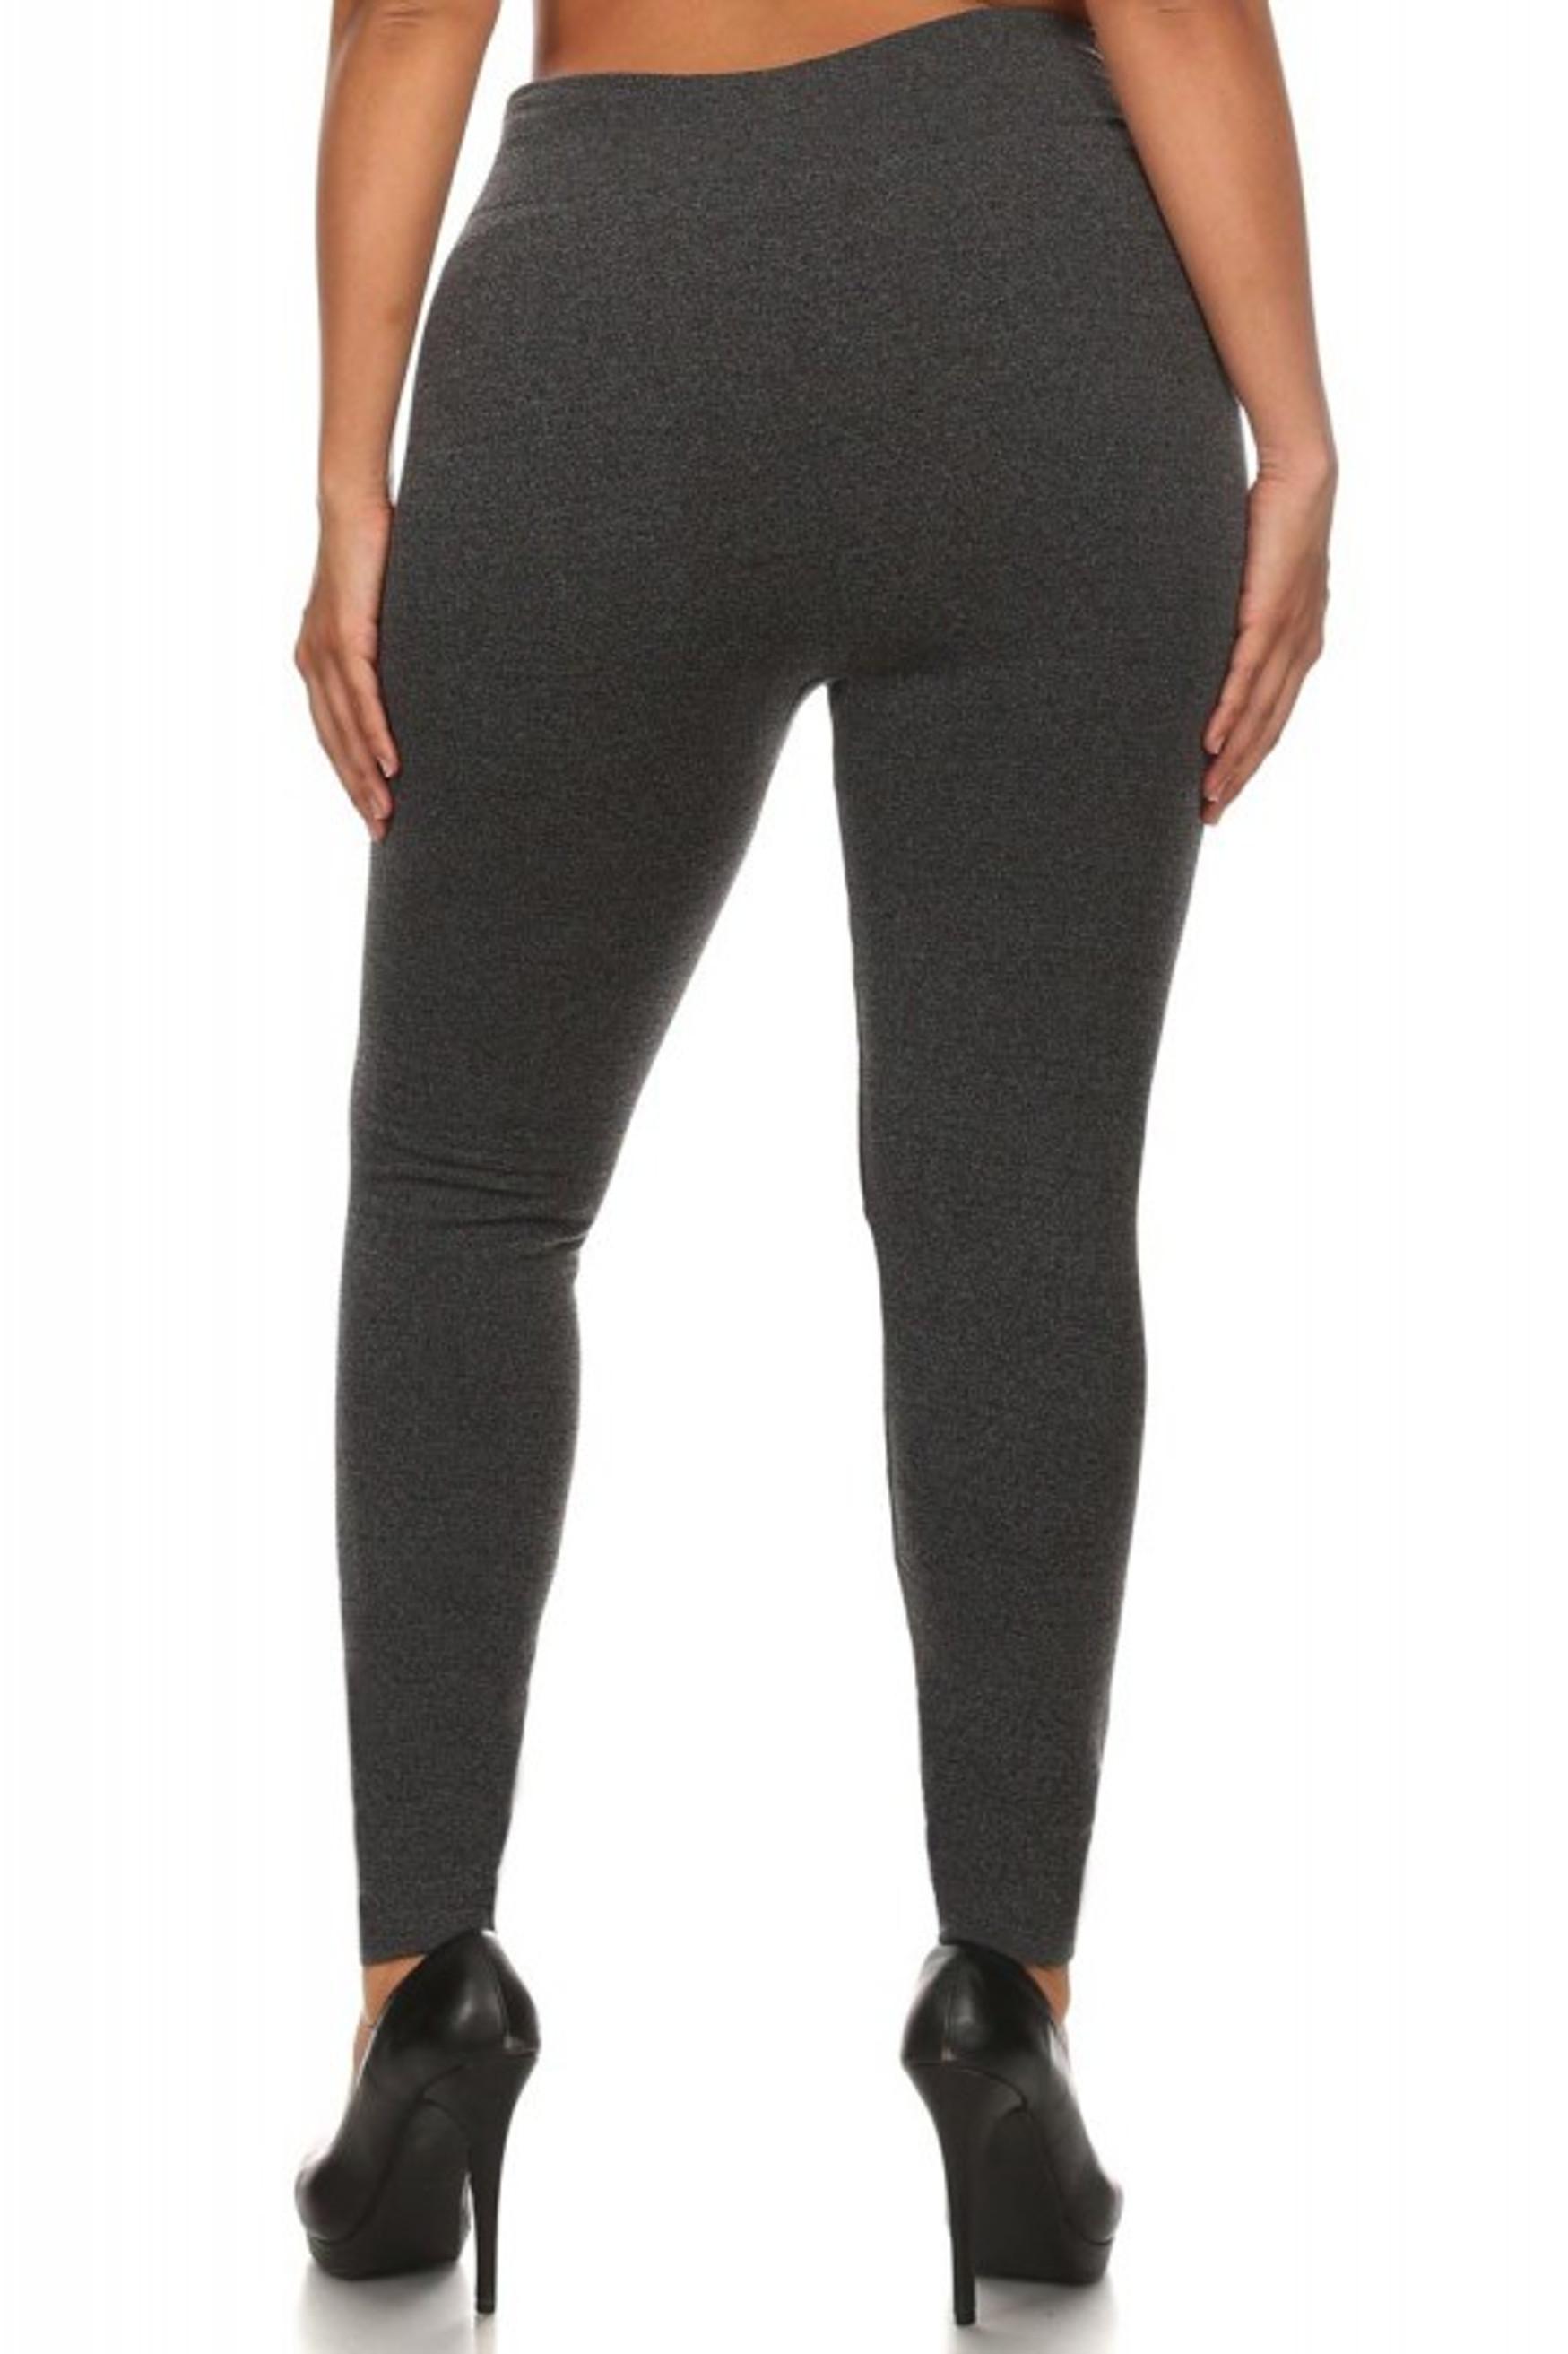 Back image of Premium Women's Fleece Lined Plus Size Leggings